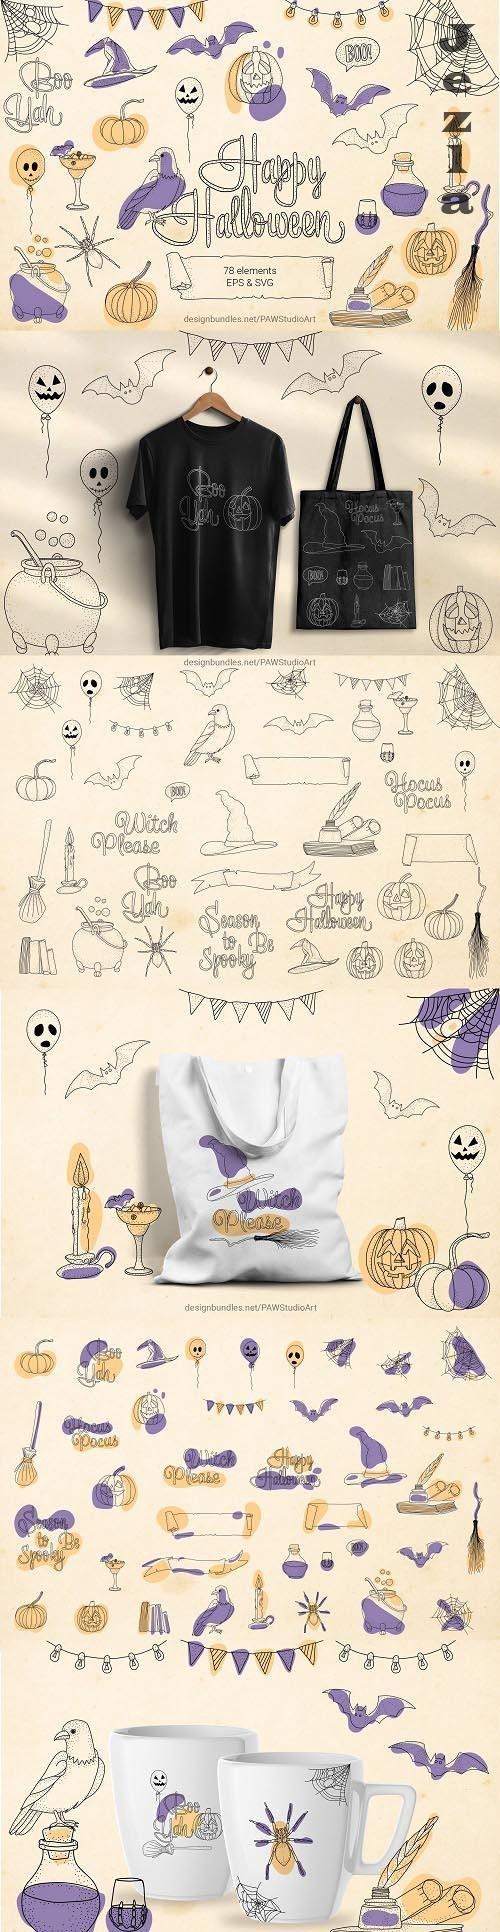 Halloween SVG Sign Bundle Spooky Clipart - 1547356